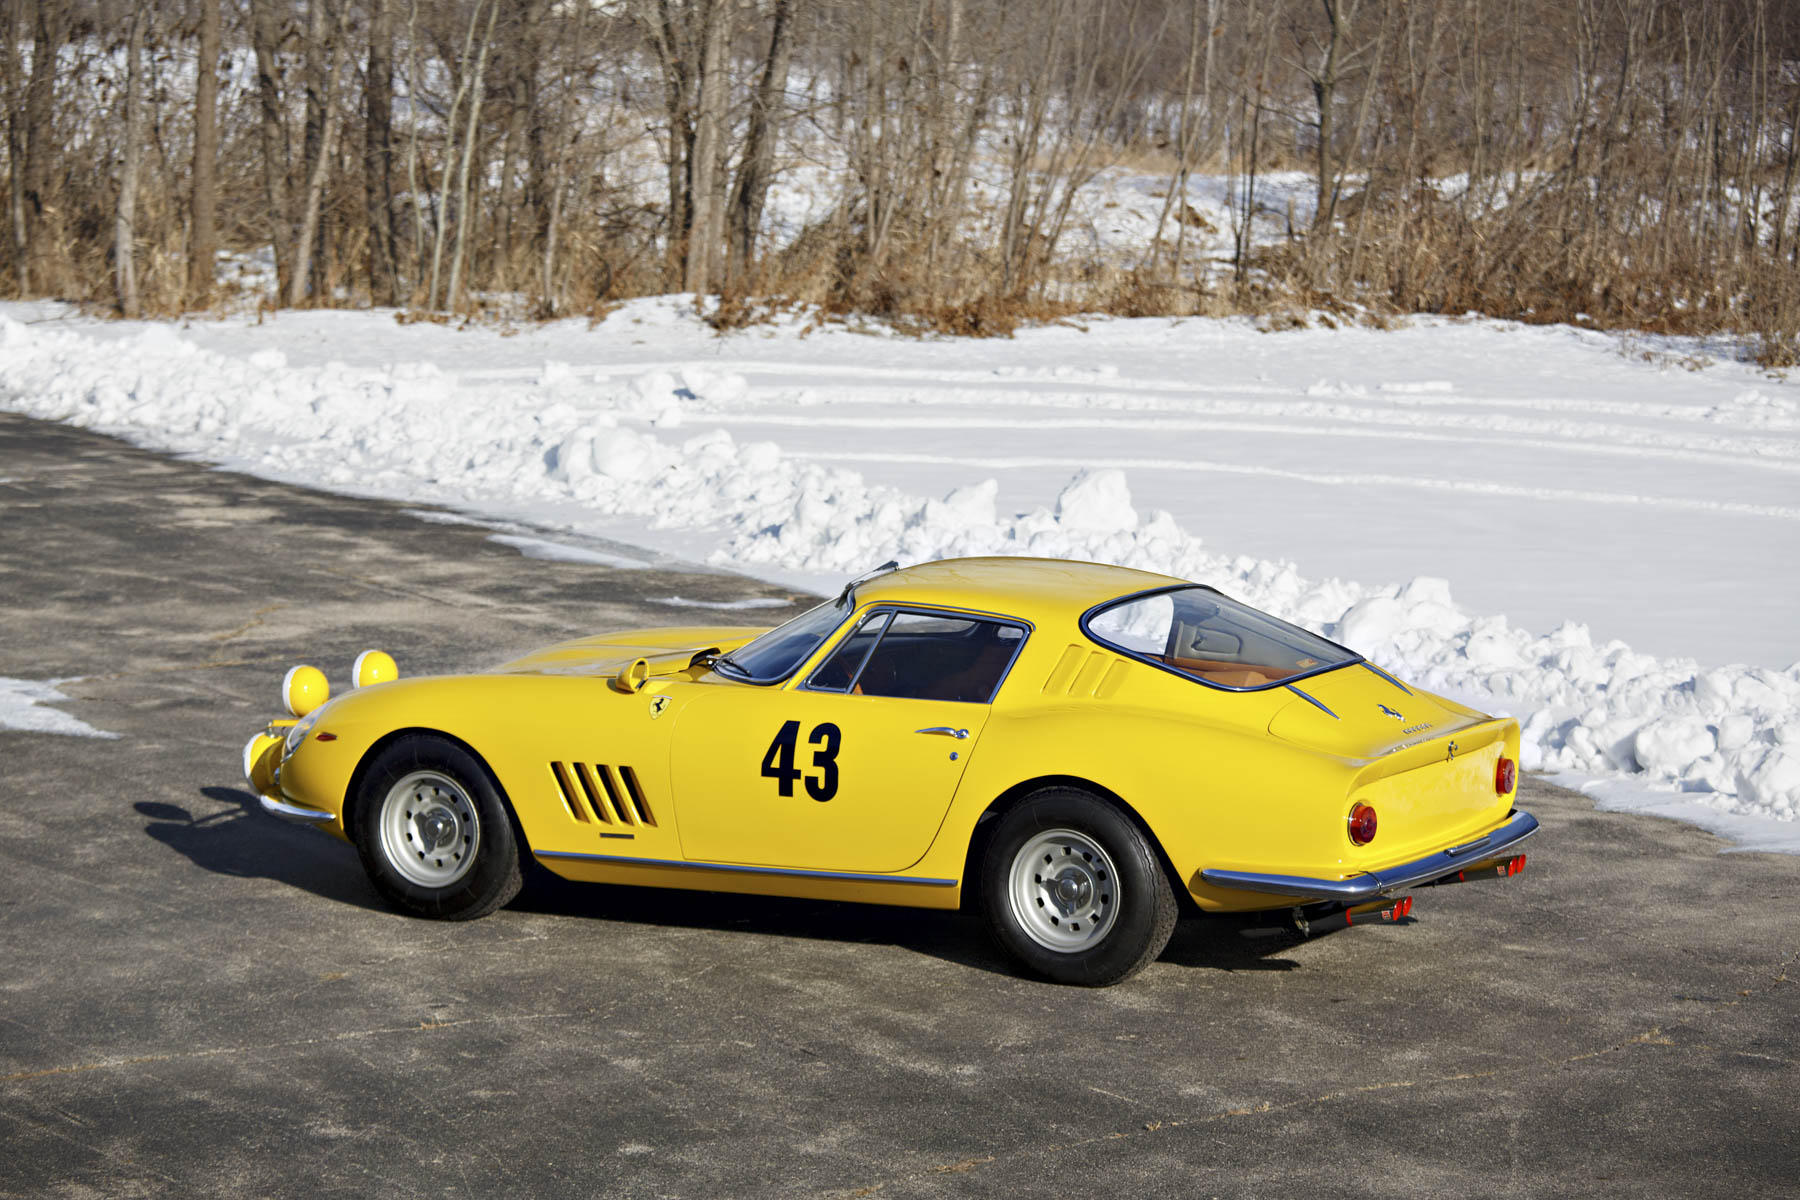 1964 Ferrari 275 GTB Prototype rear 3/4